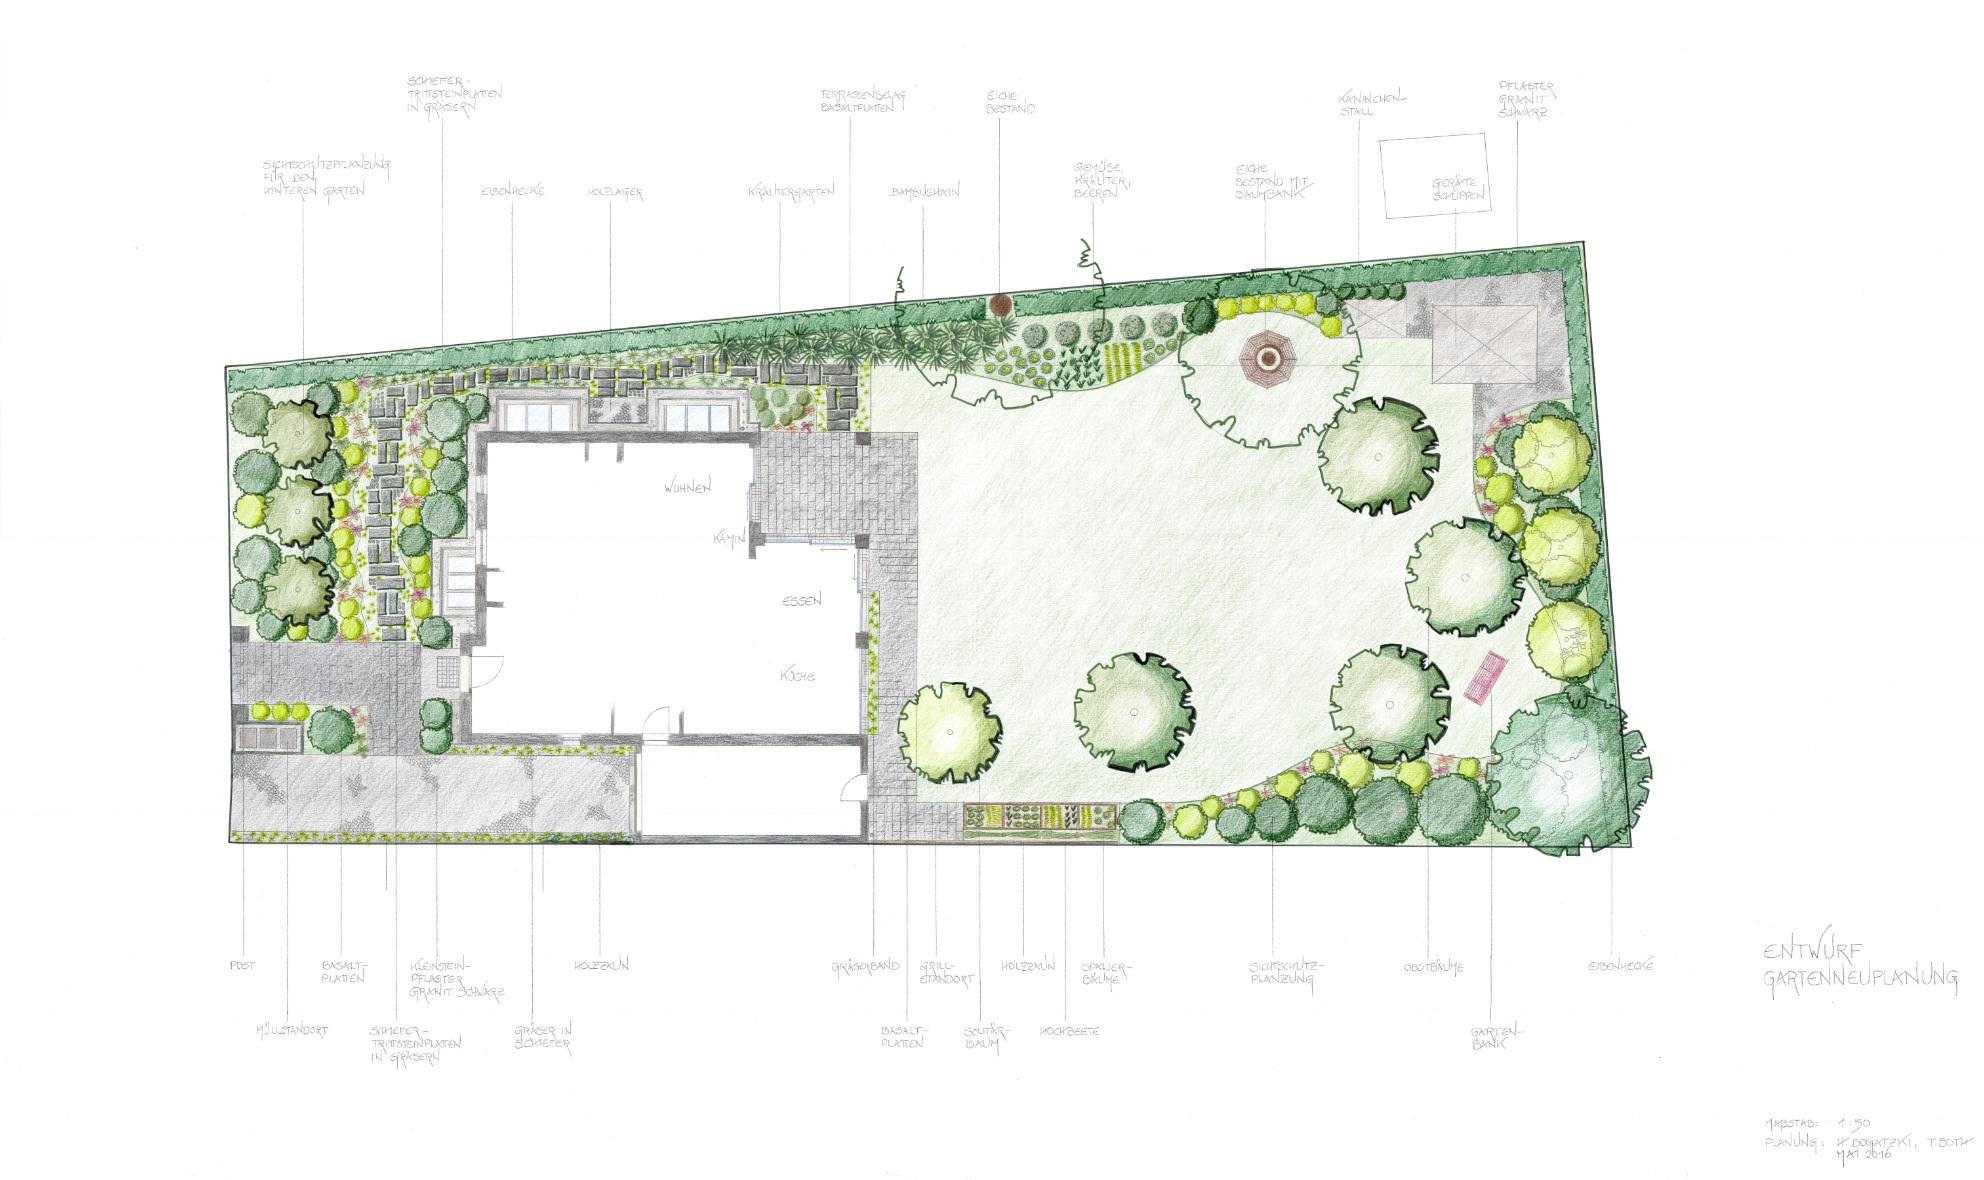 Heike_Bogatzki_Gartengestaltung.jpg